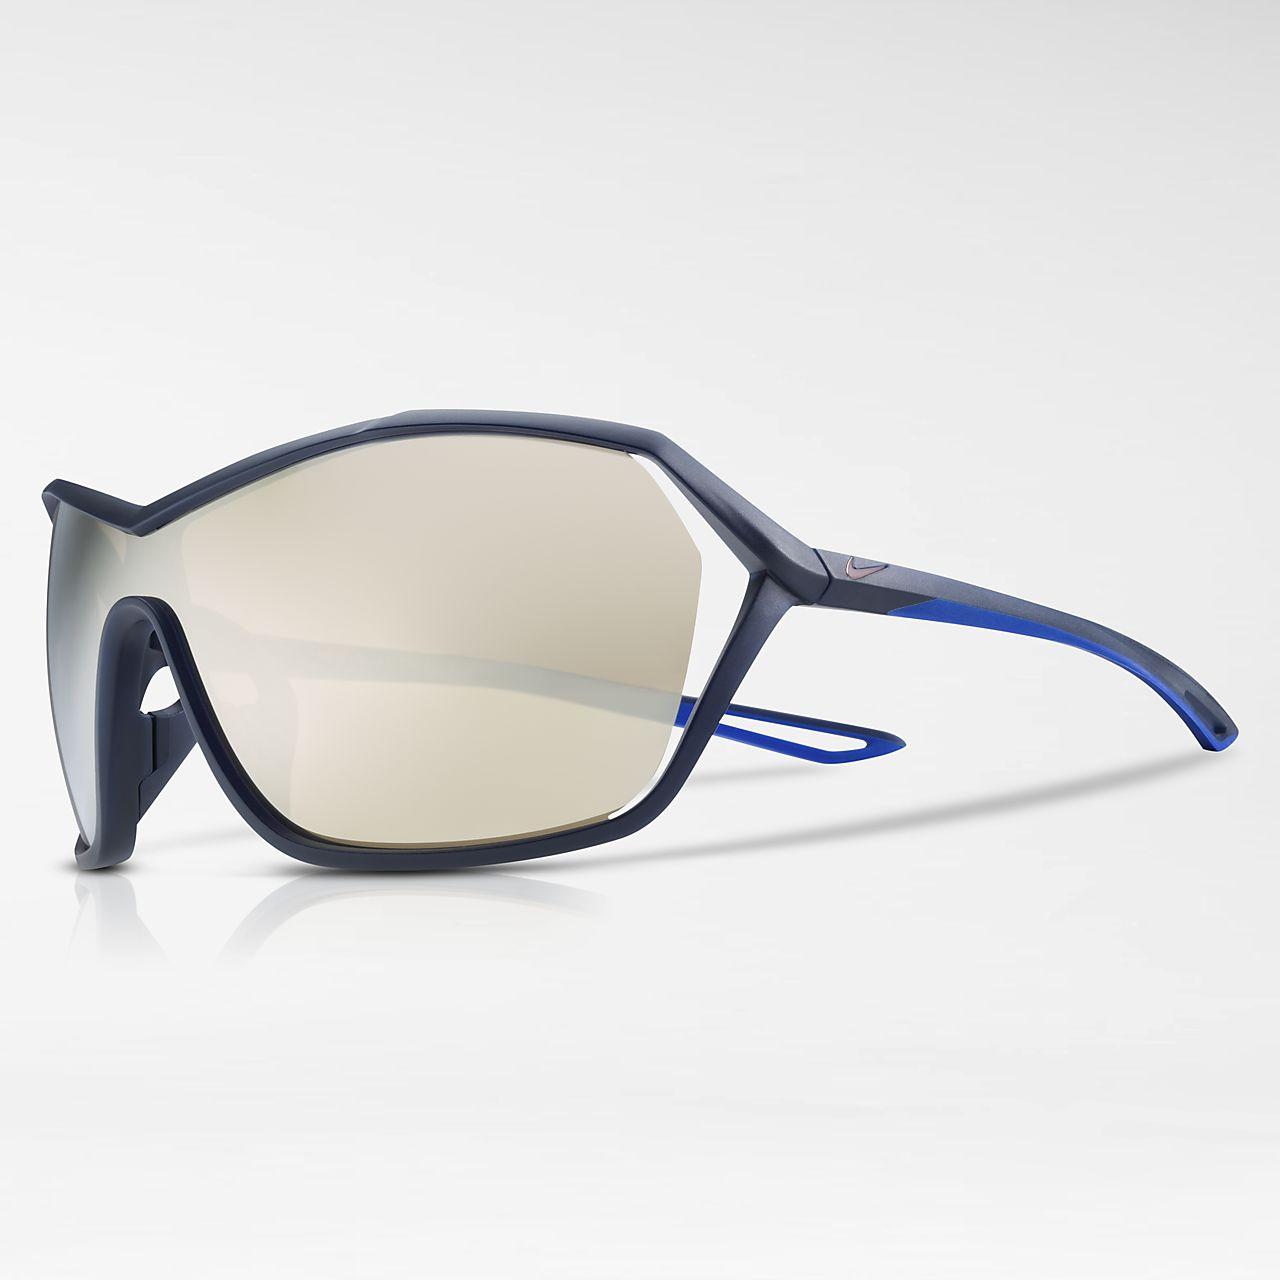 d6ed5e930e Low Resolution Nike Helix Elite Mirrored Sunglasses Nike Helix Elite  Mirrored Sunglasses